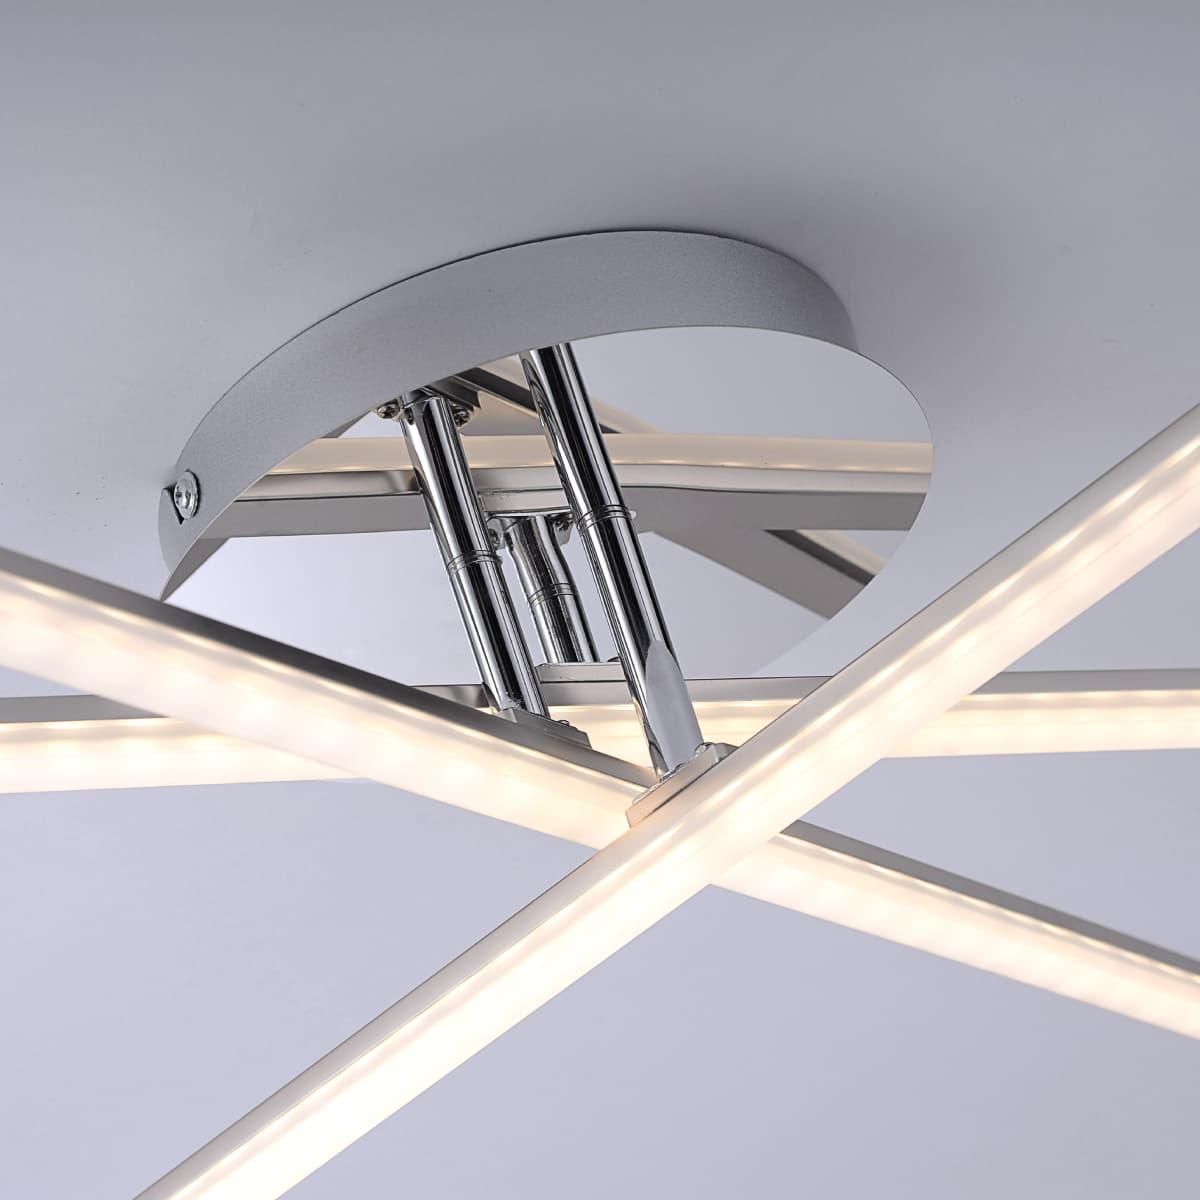 LED Deckenleuchte in stahlfarben inkl. drehbarer Leuchtenarme